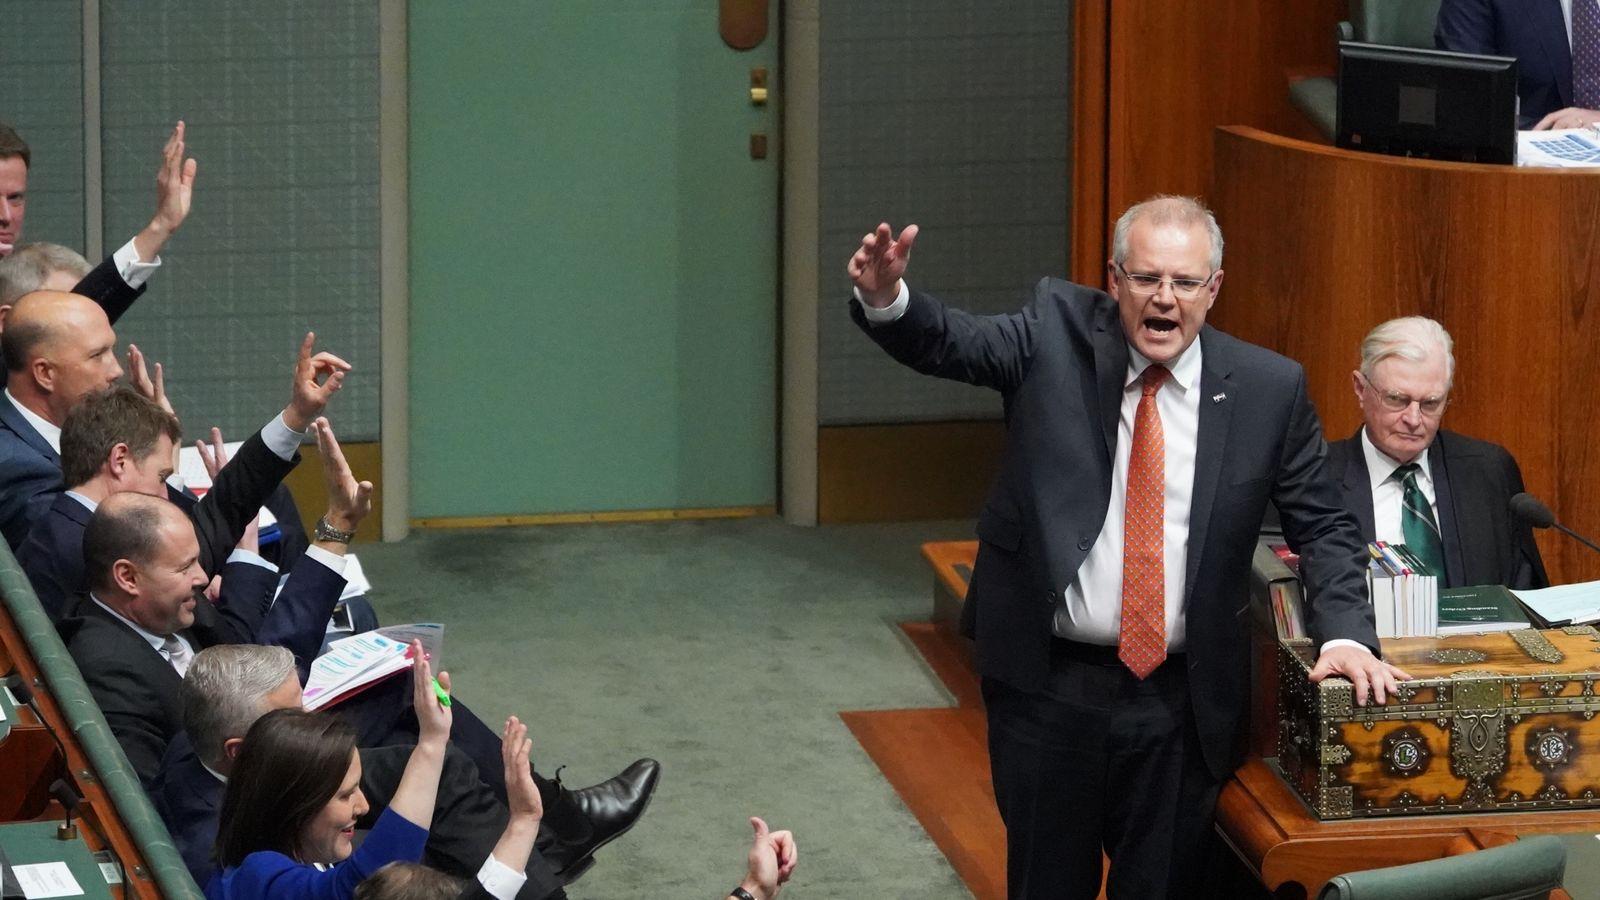 Australian PM Scott Morrison apologises for using explicit Fatman Scoop song in video